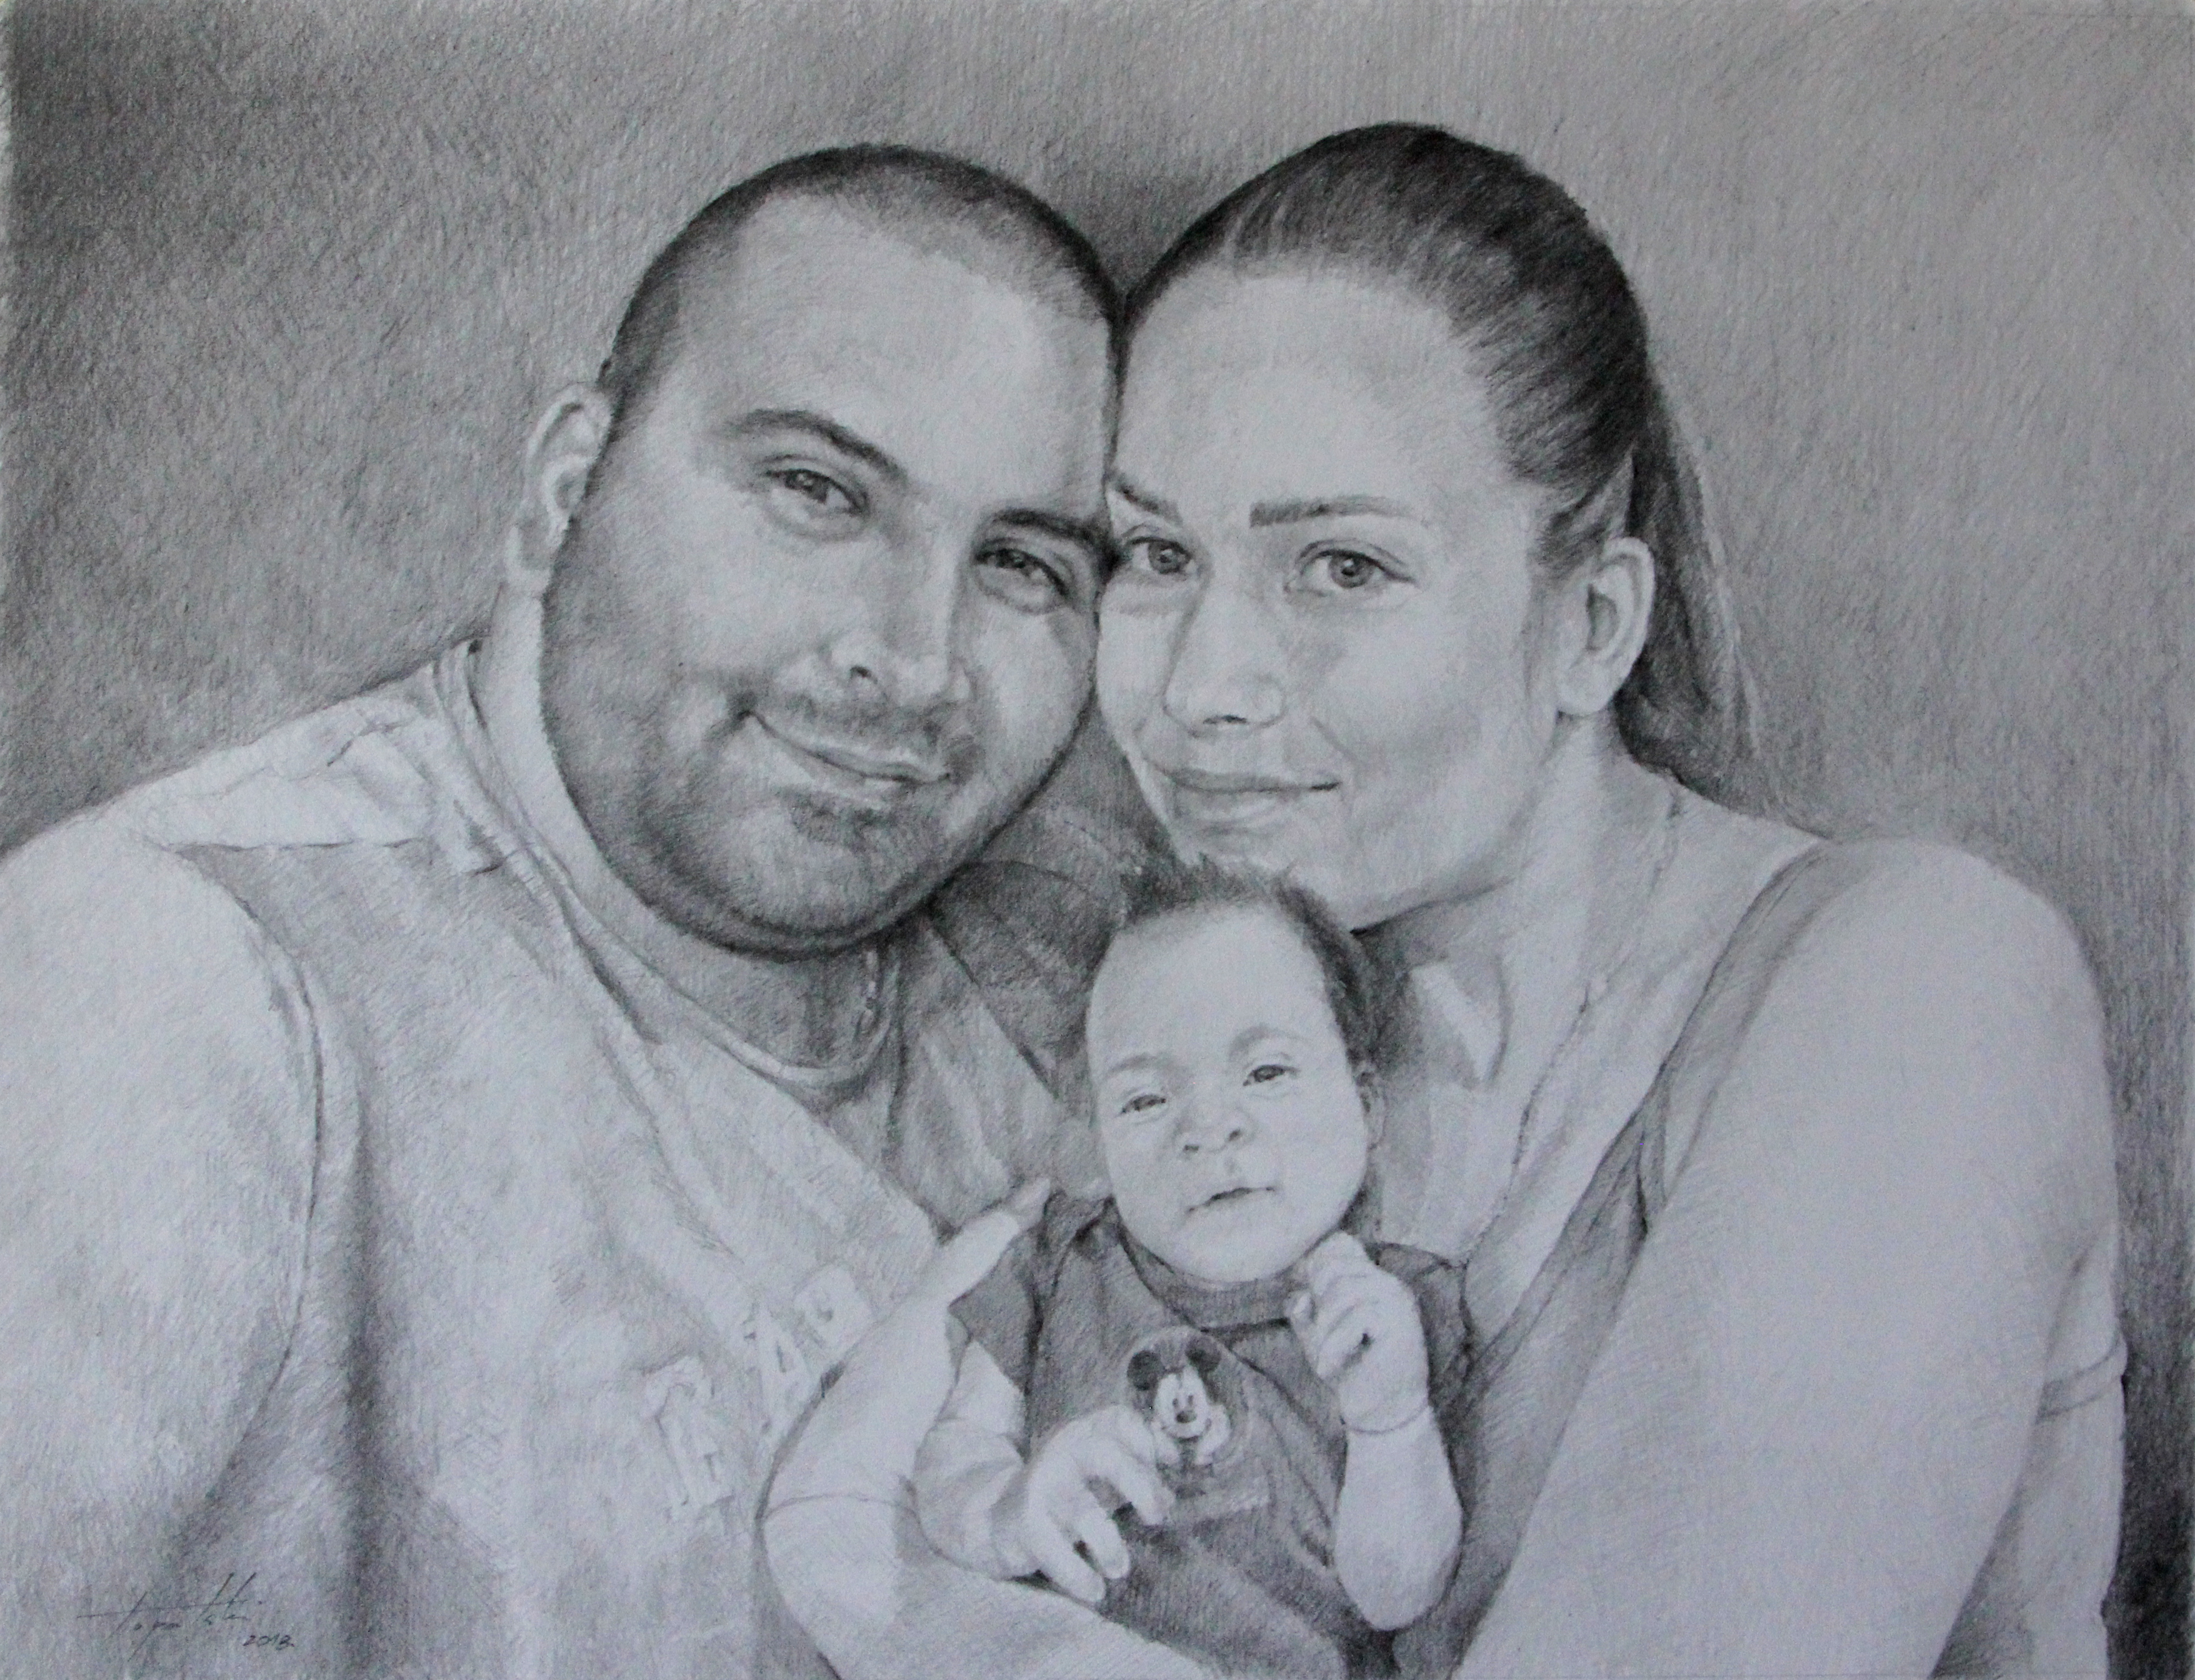 Porodičan Portret - 30x40cm, 2018. Crtež olovka umetnik Darko Topalski